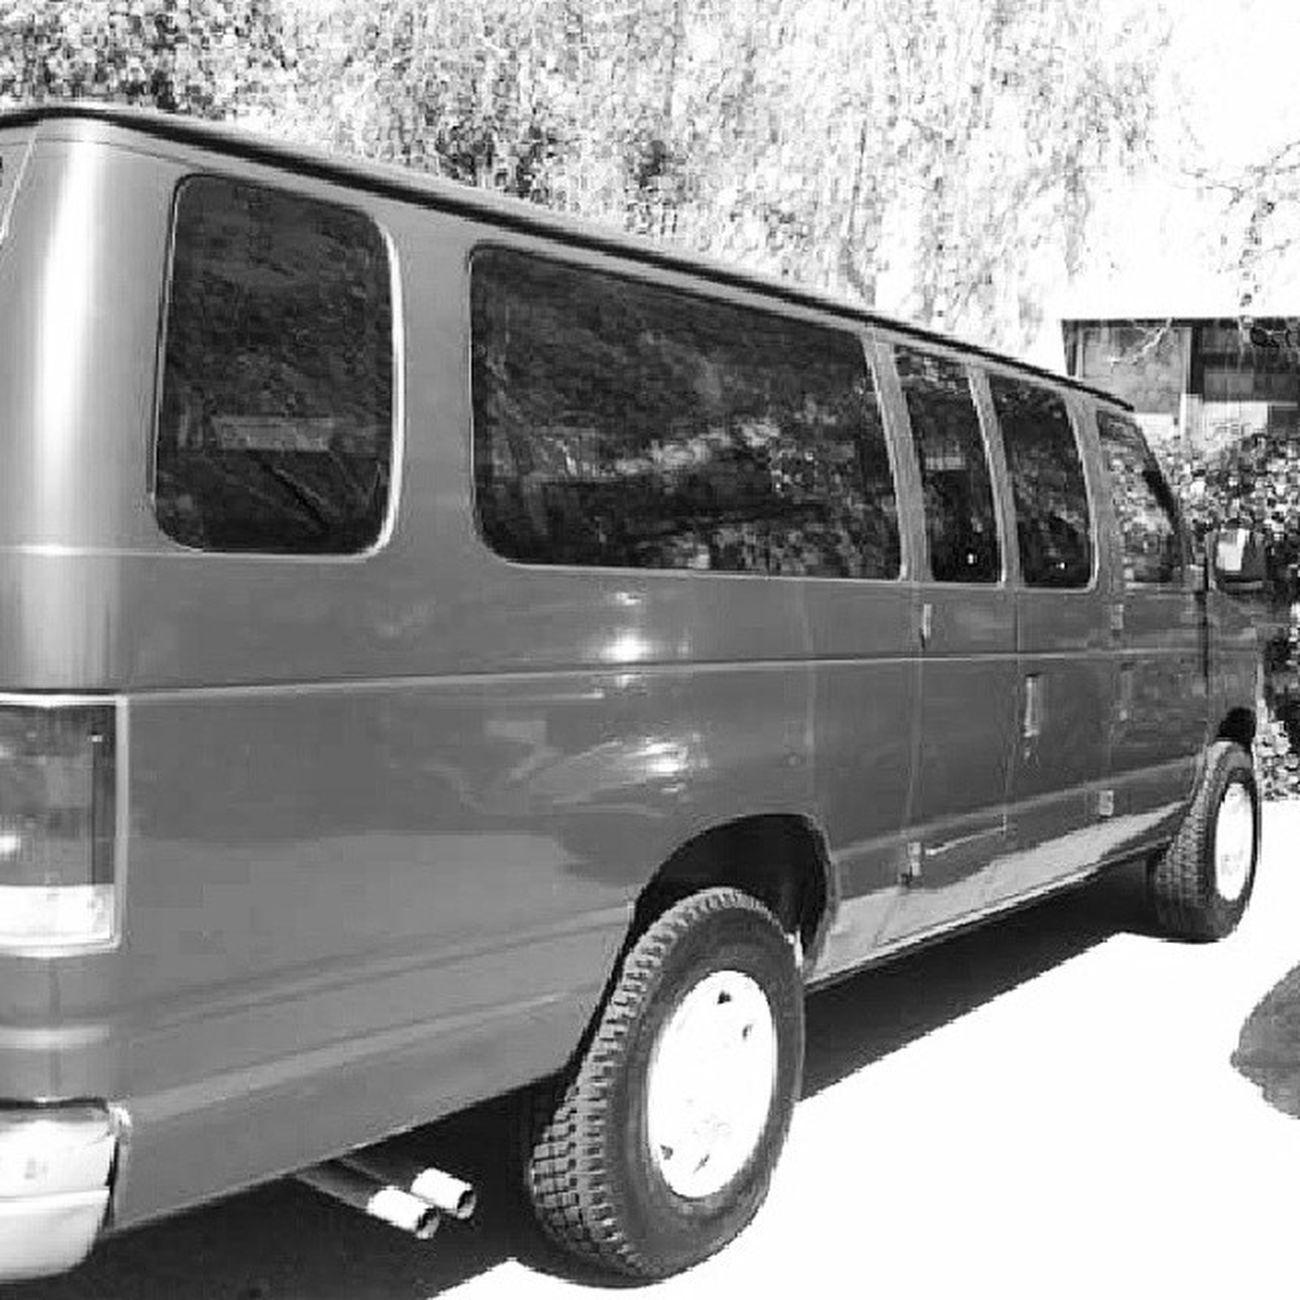 Retconstruct BandWagon Tourbus Bandvan bandtourbus lifeontheroad whereverimayroam notrailerneeded musiciansknow readytotour westcoasttour havevanwilltravel